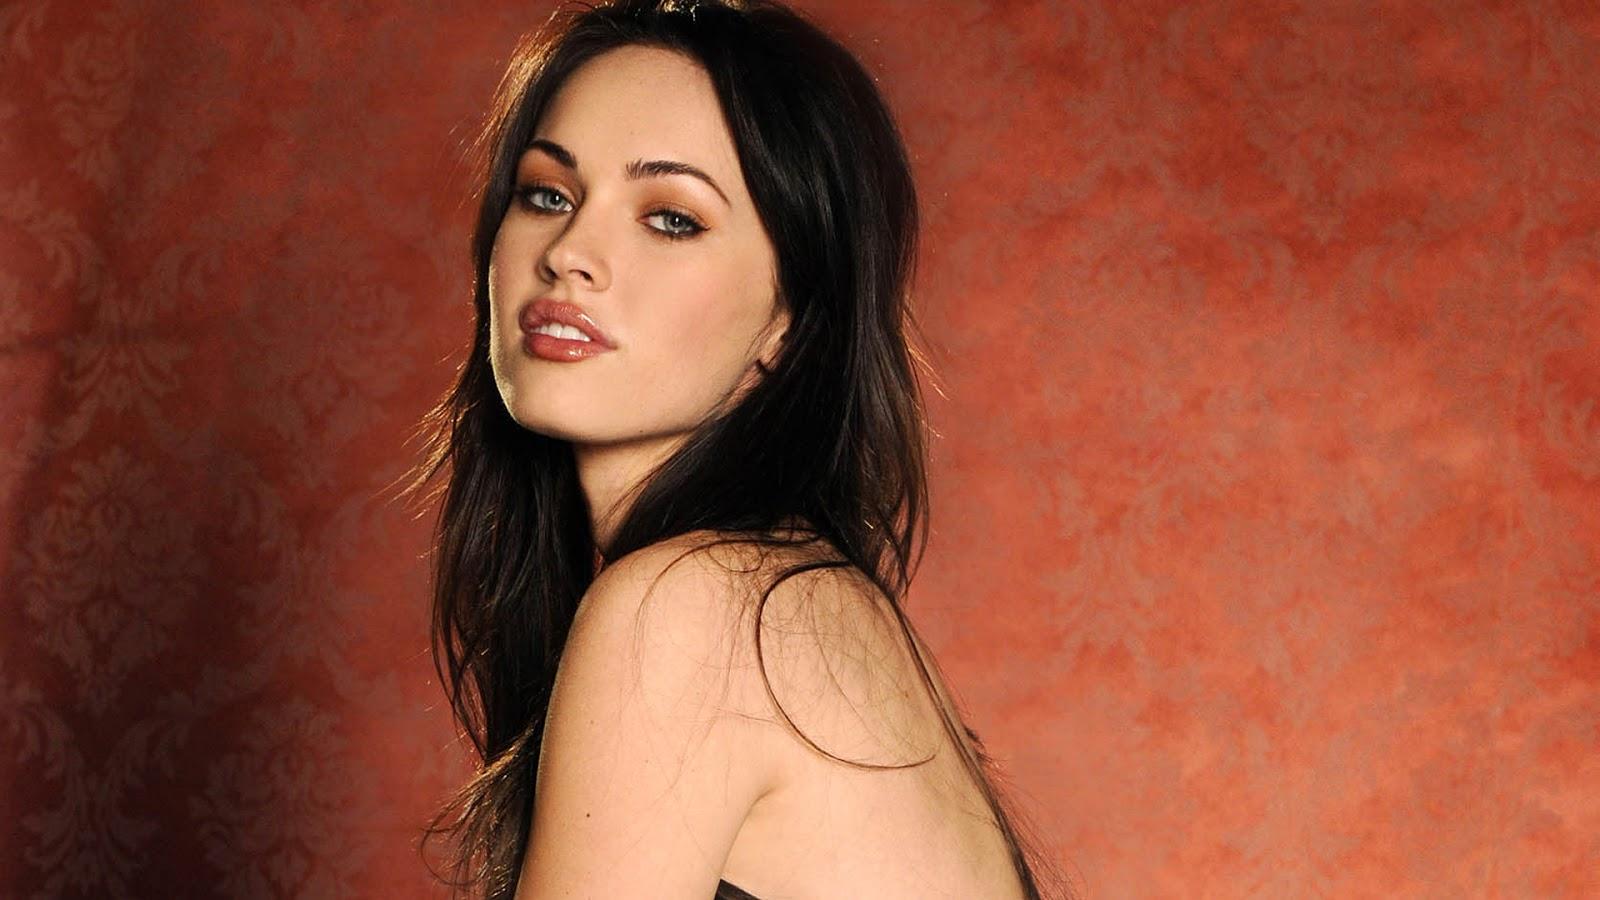 Finest Wallpapers Of Megan Fox Nude Photos